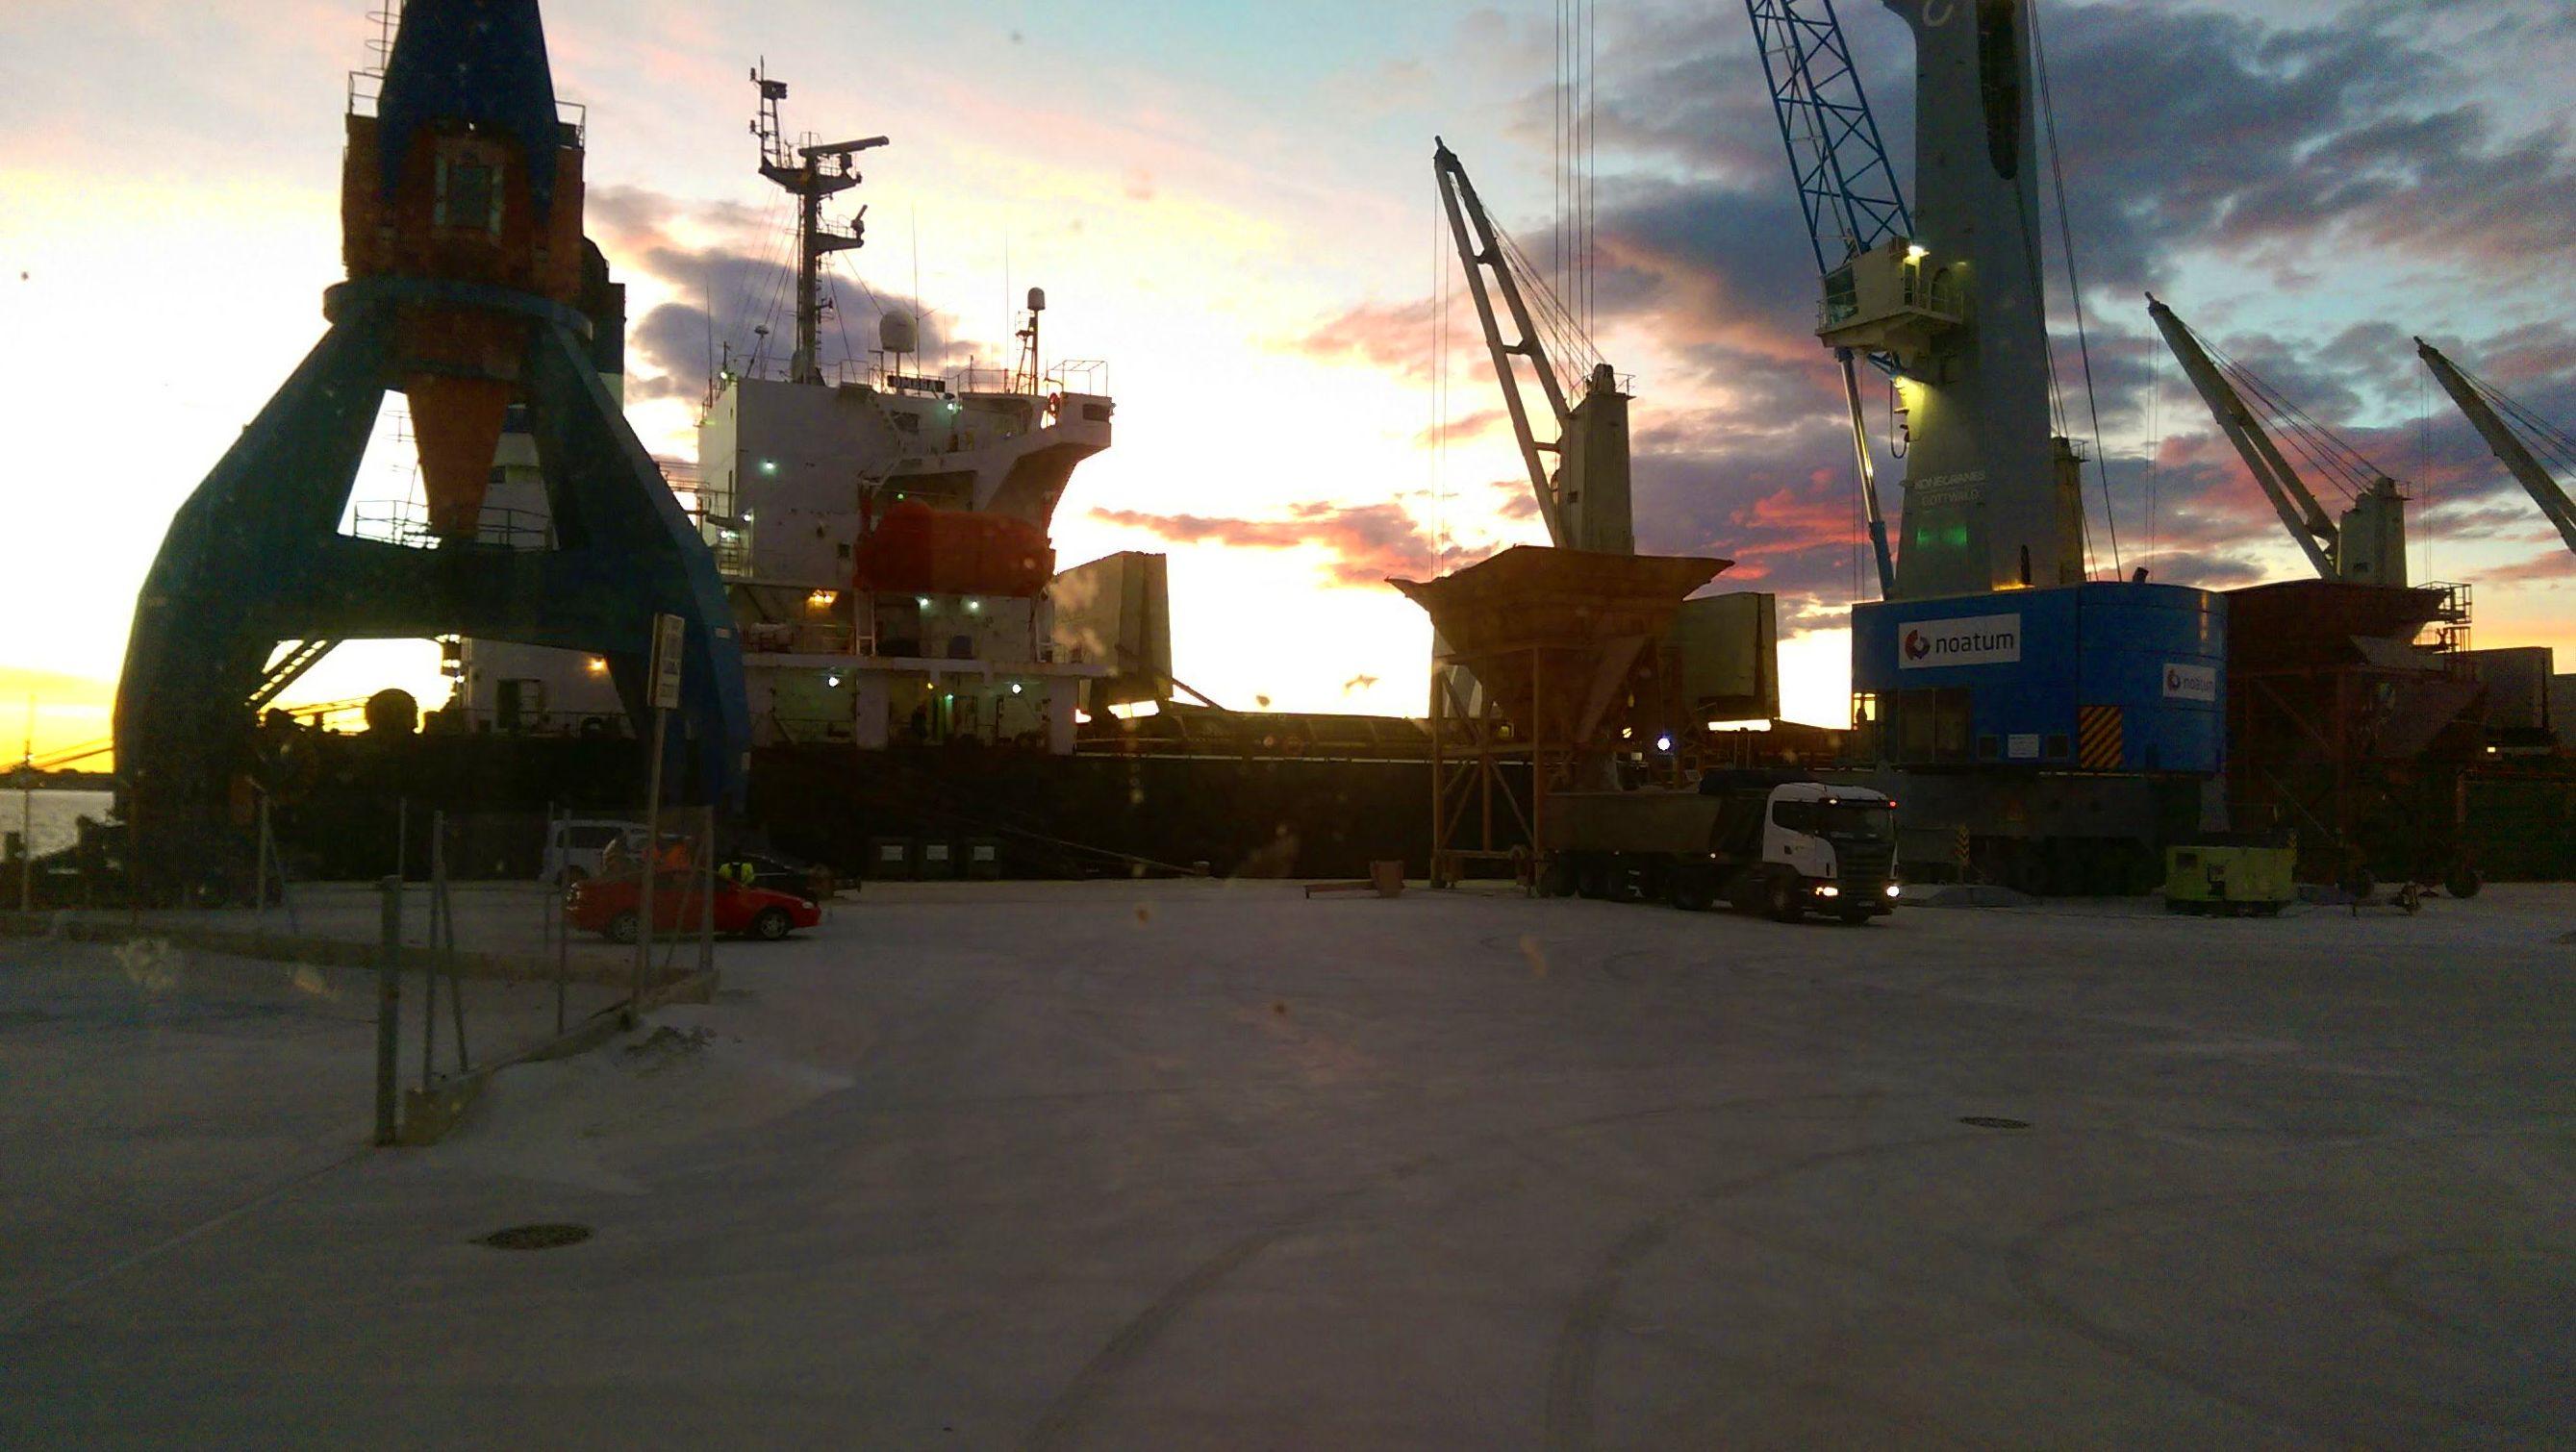 Foto 3 de Transporte de mercancías en Ribesalbes | EUGENIO, S. A.